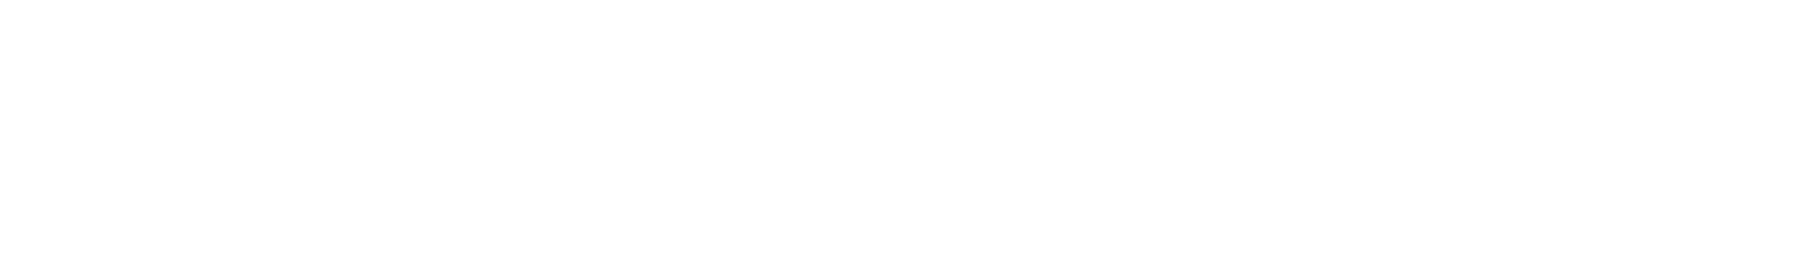 g abs05 005